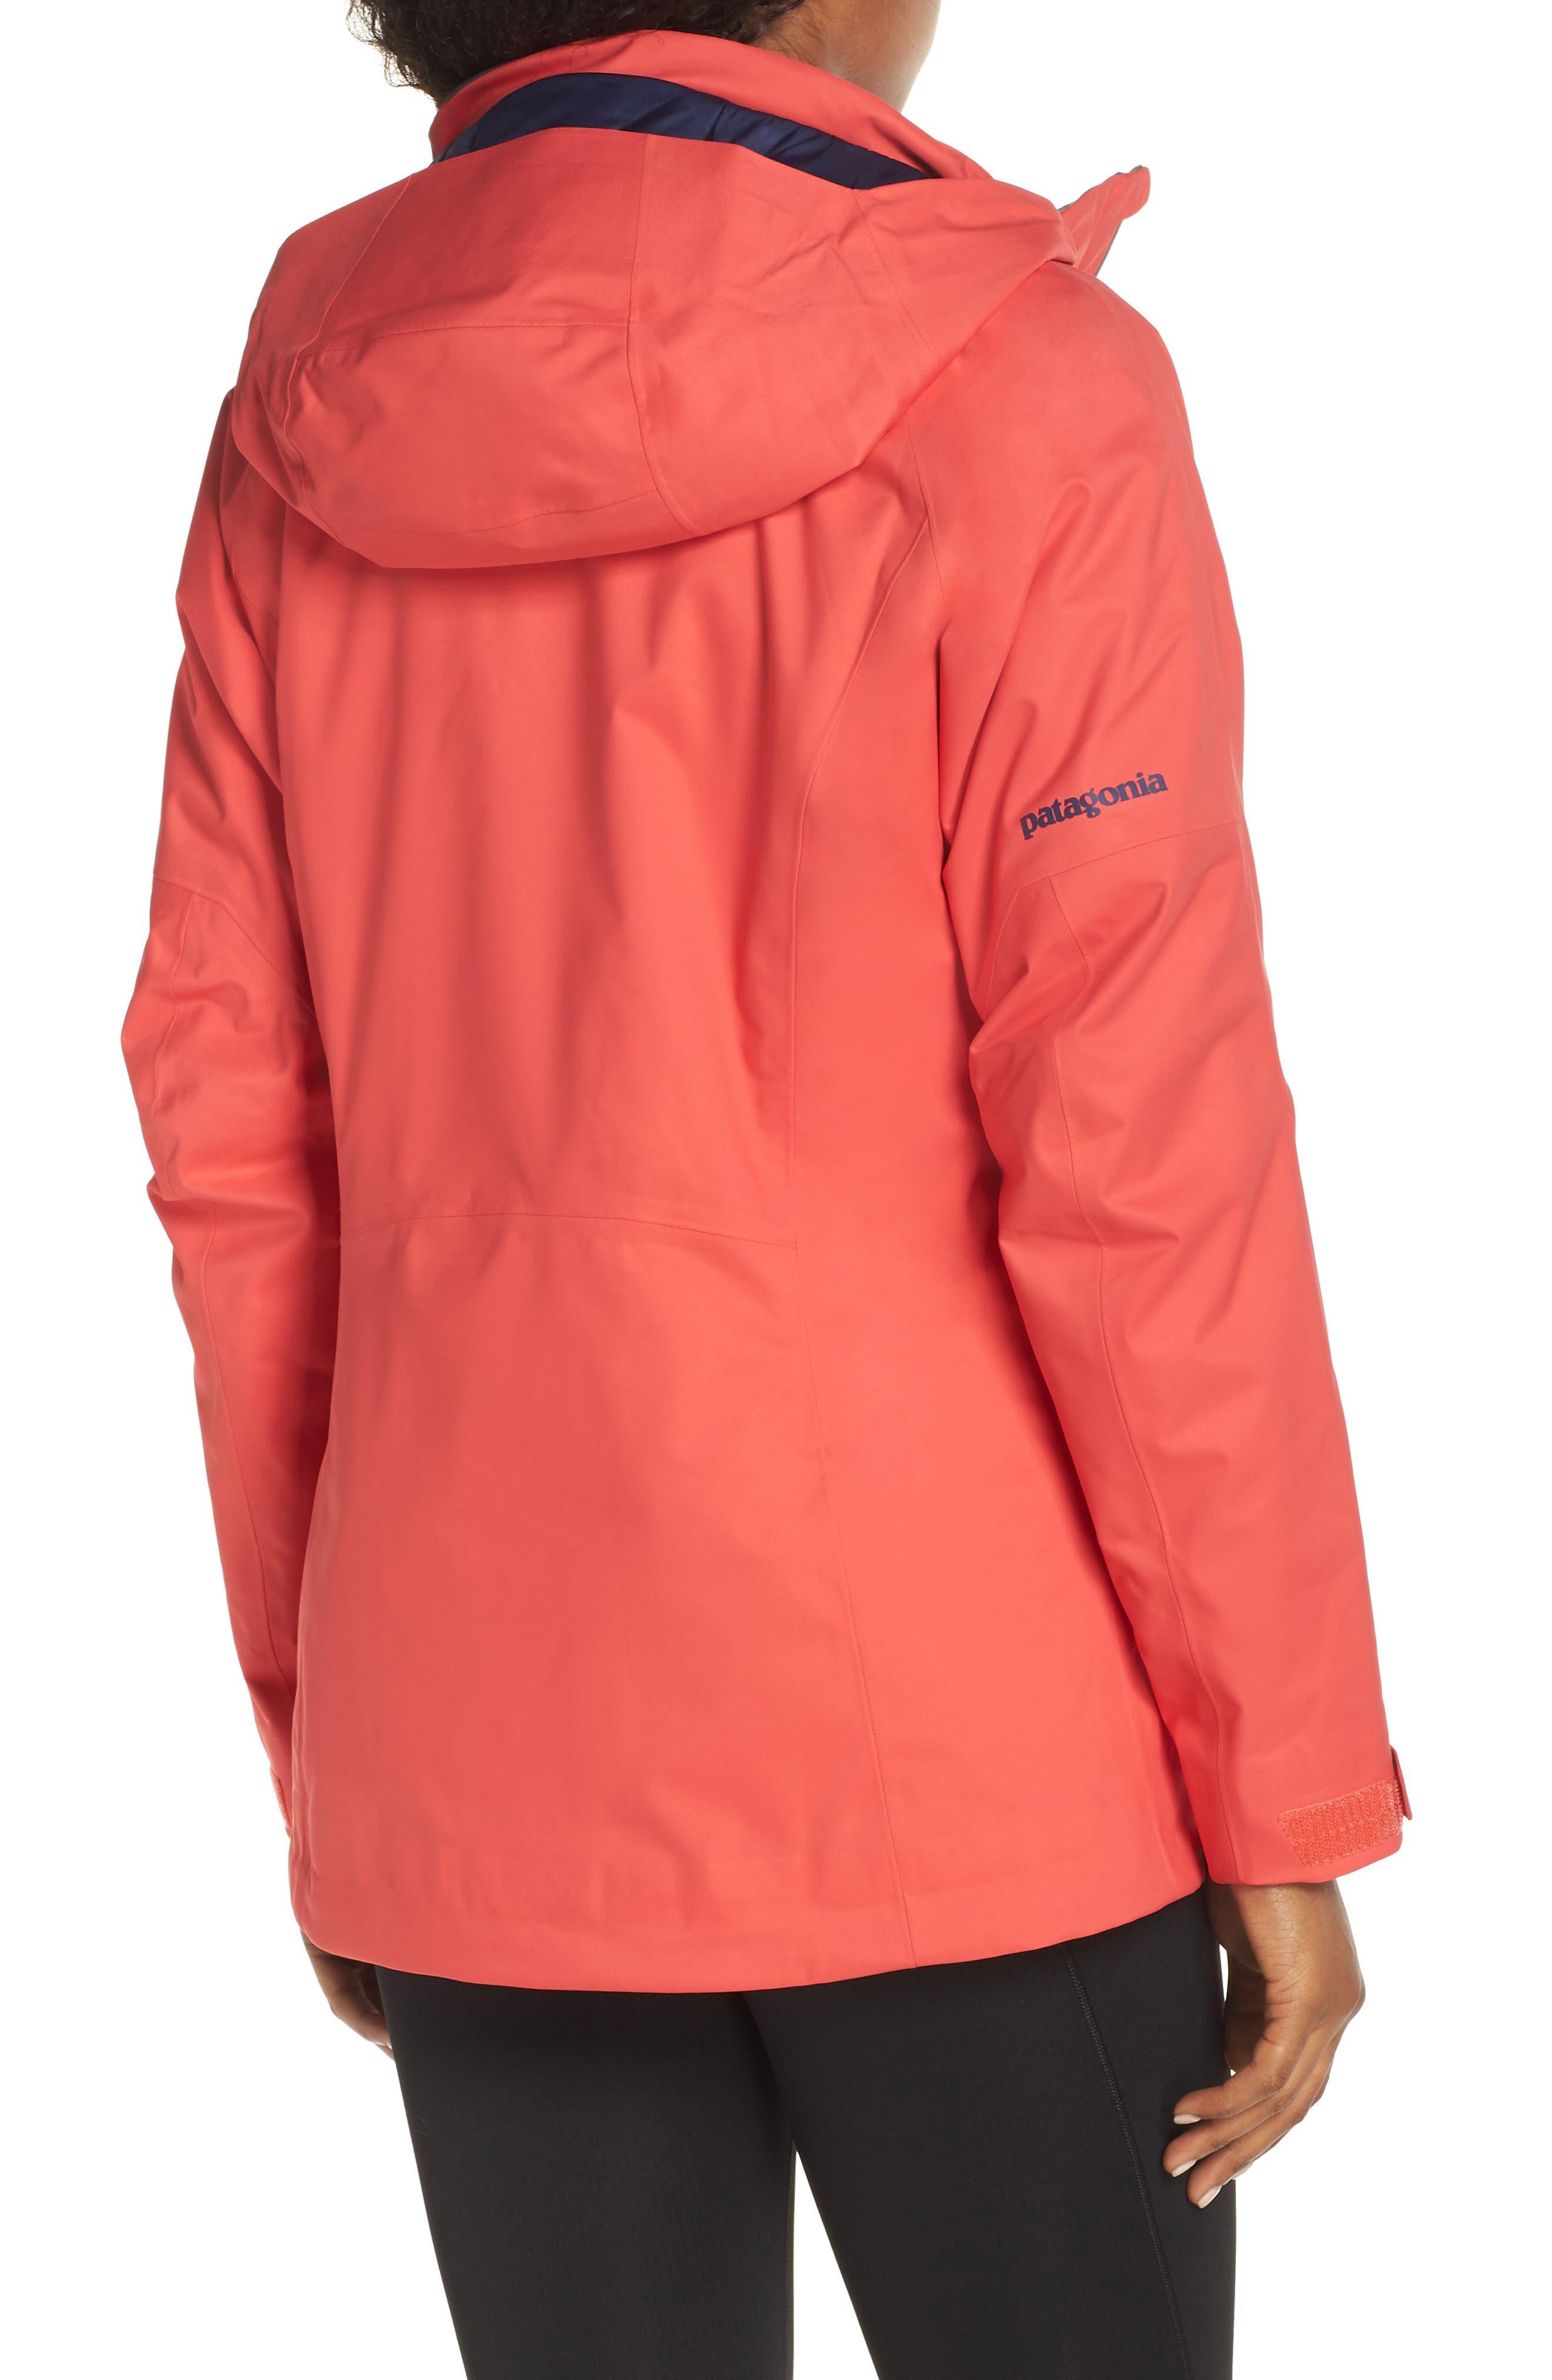 PATAGONIA,                             Snowbelle Insulated Ski Jacket,                             Alternate thumbnail 2, color,                             601